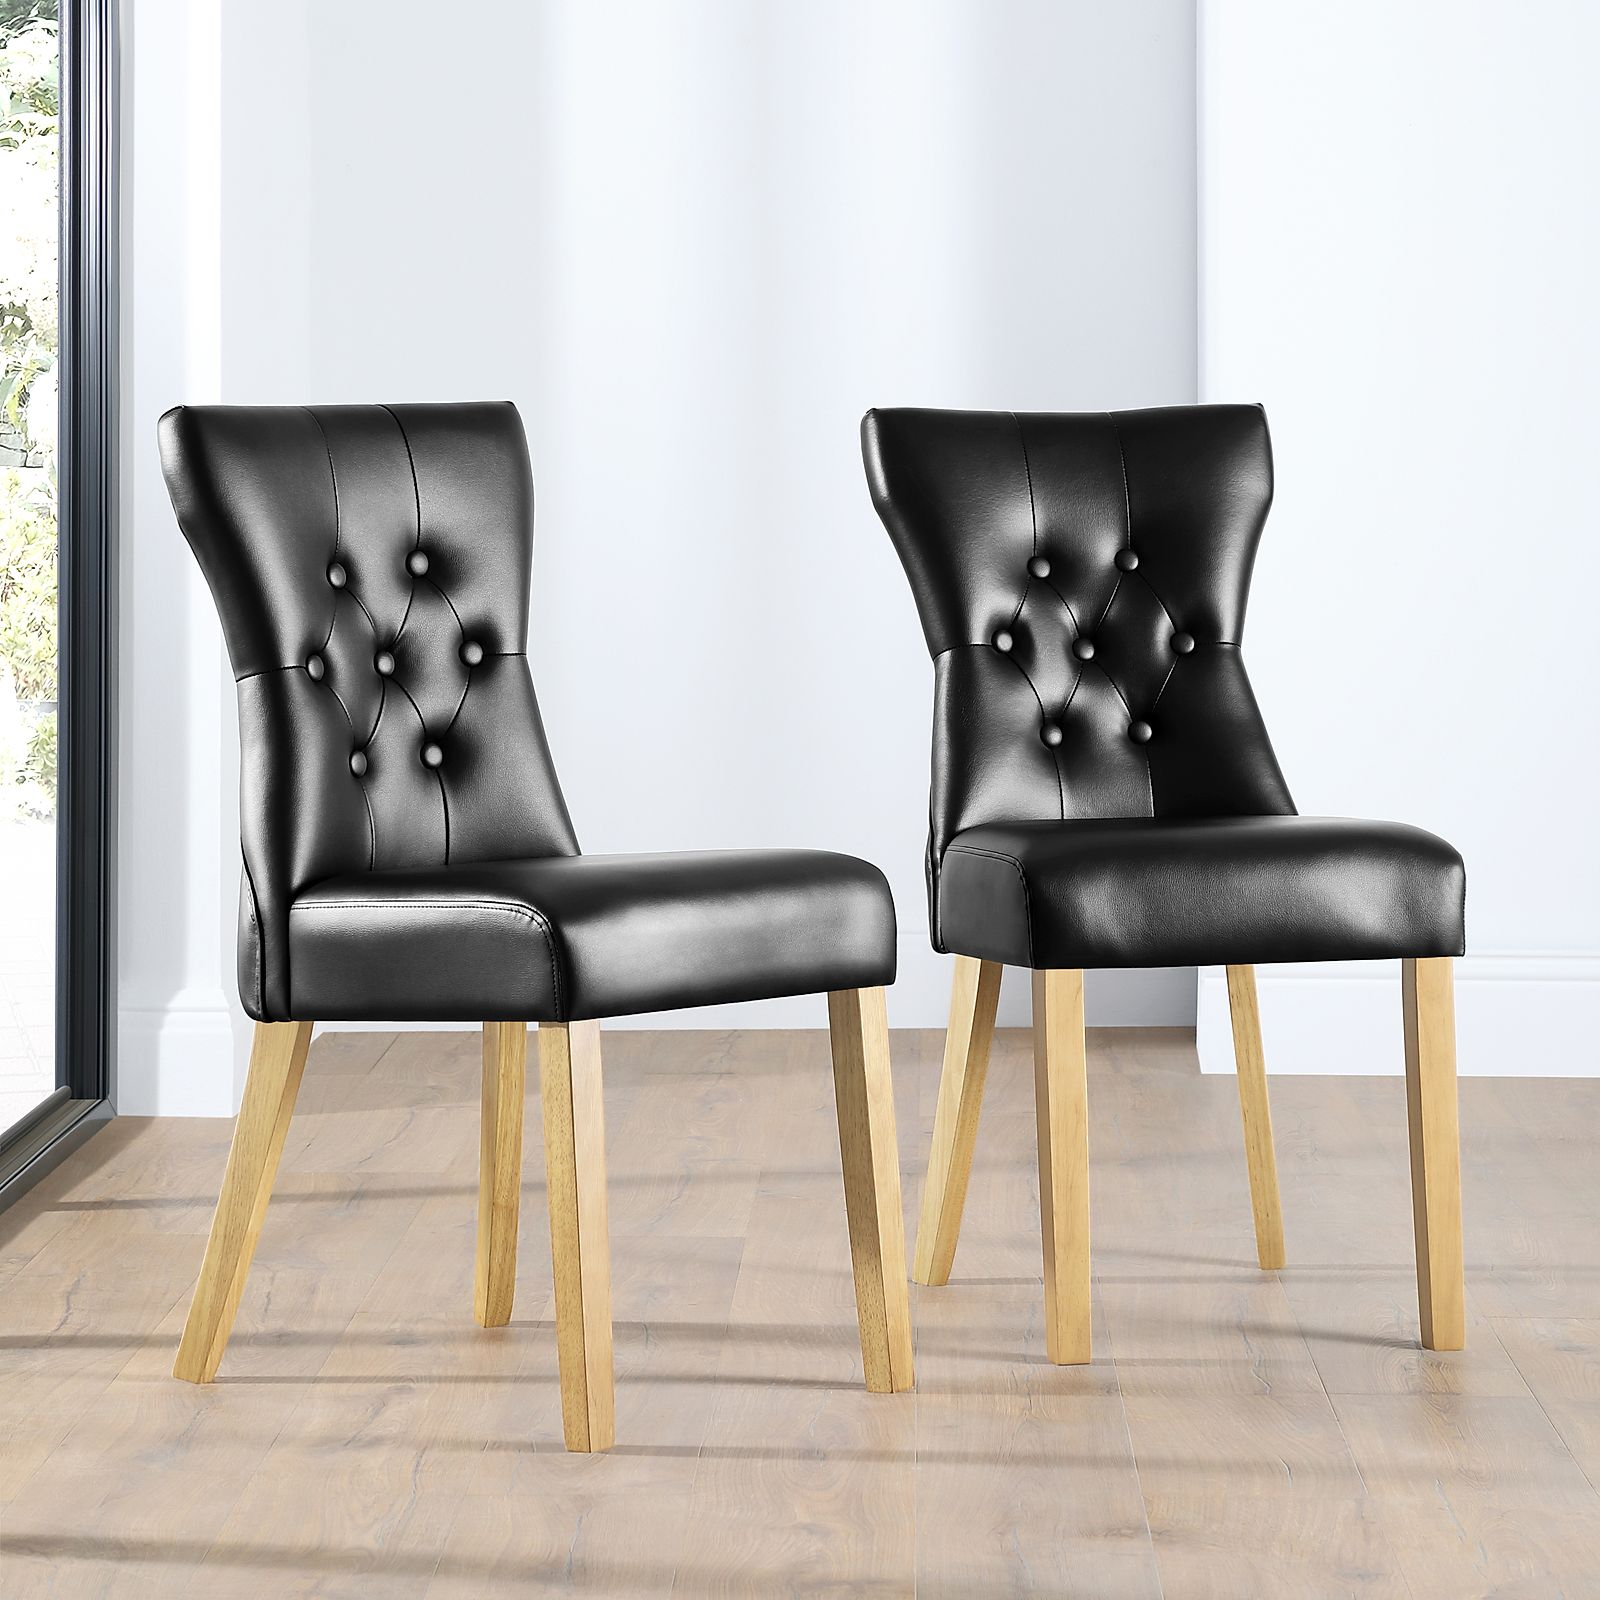 Bewley Black Leather Button Back Dining Chair Oak Leg